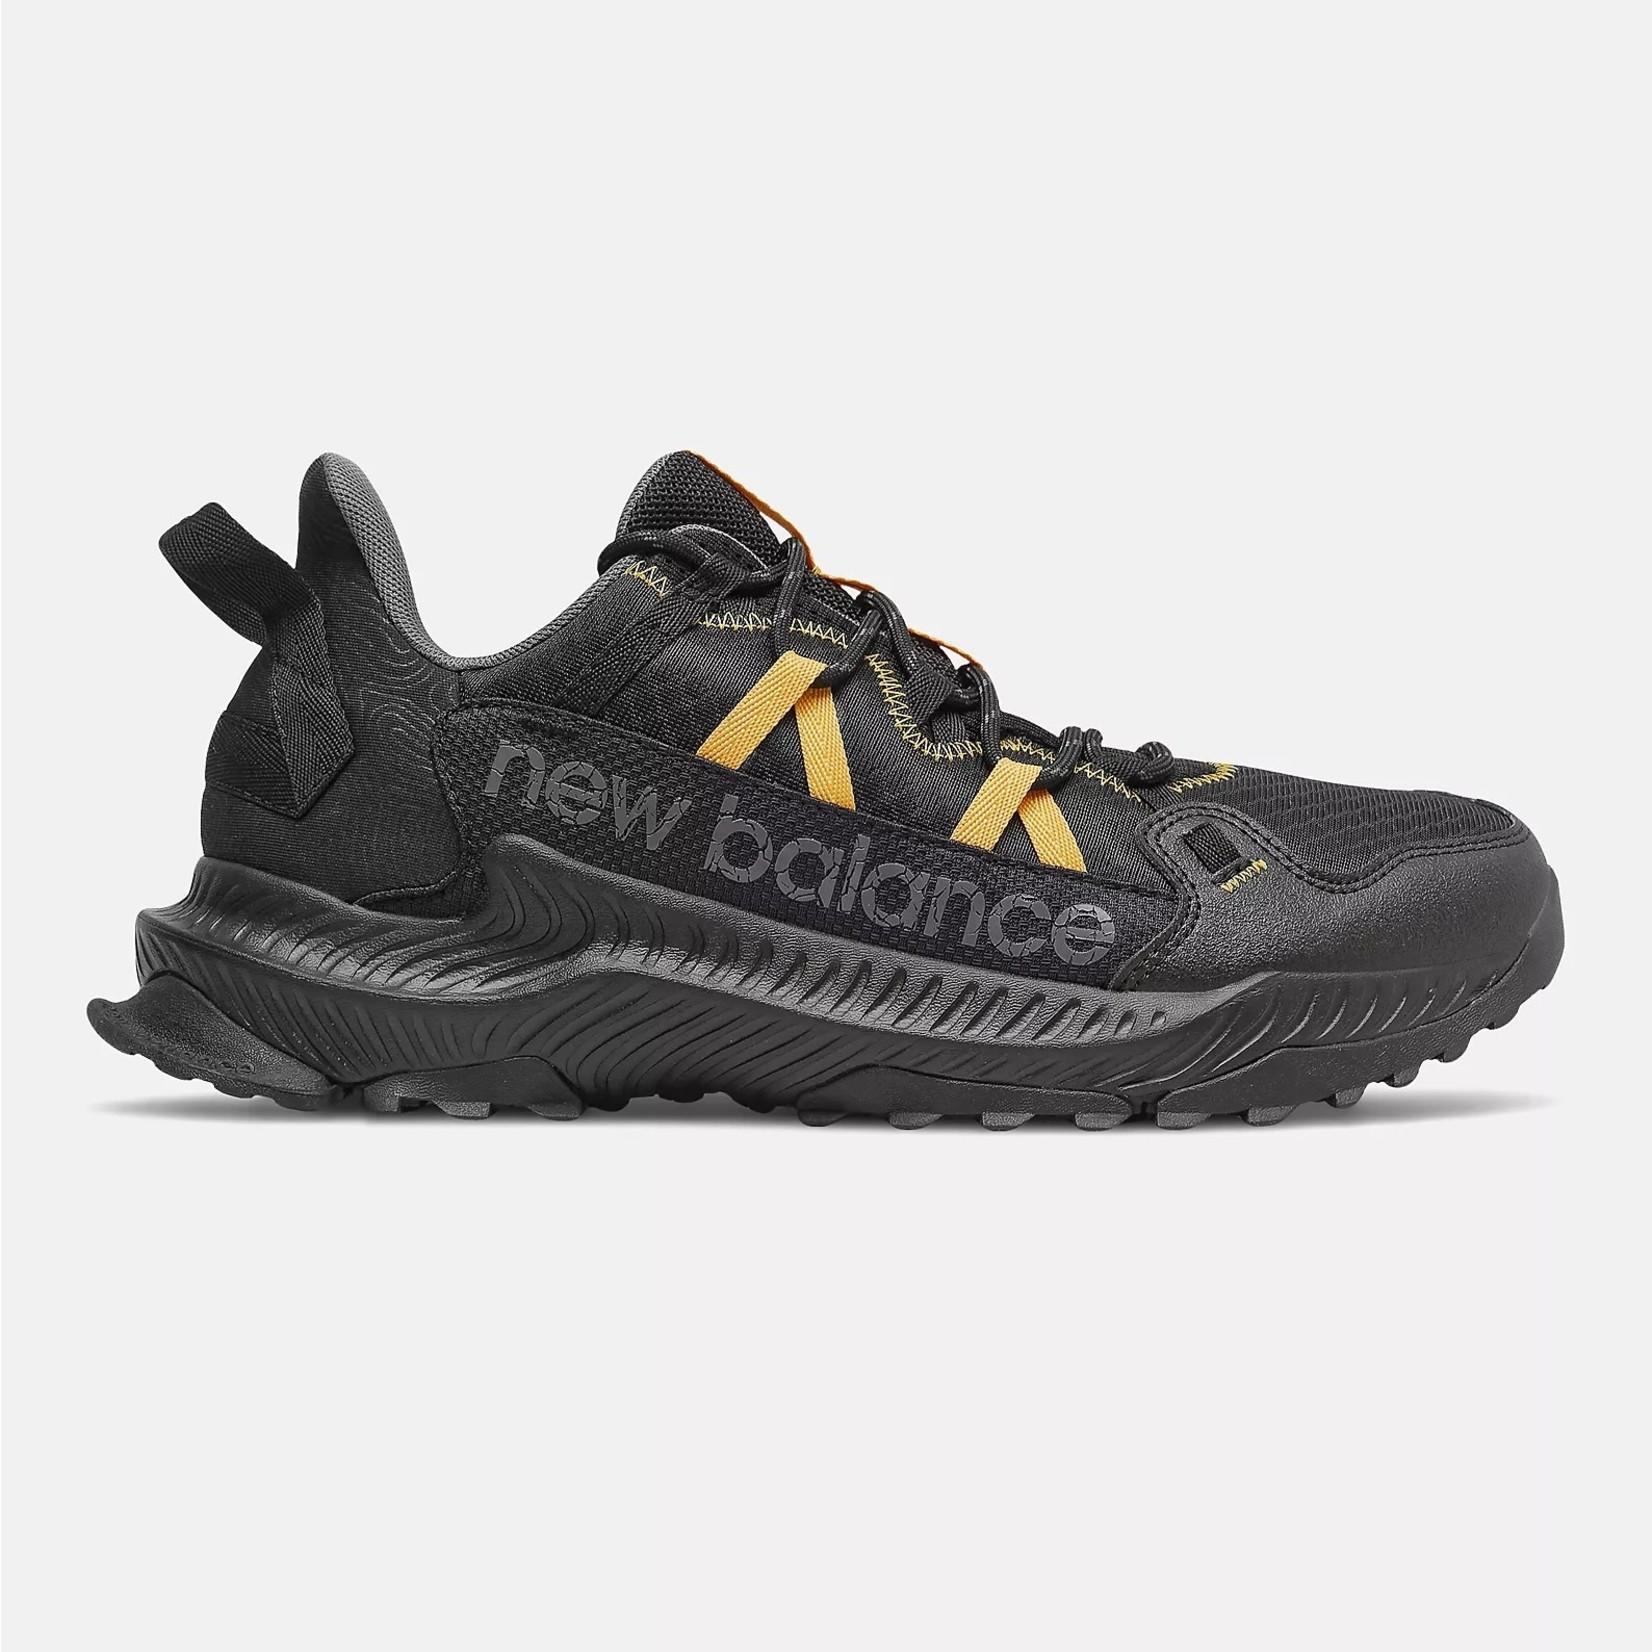 New Balance New Balance Trail Running Shoes, Shando, Mens